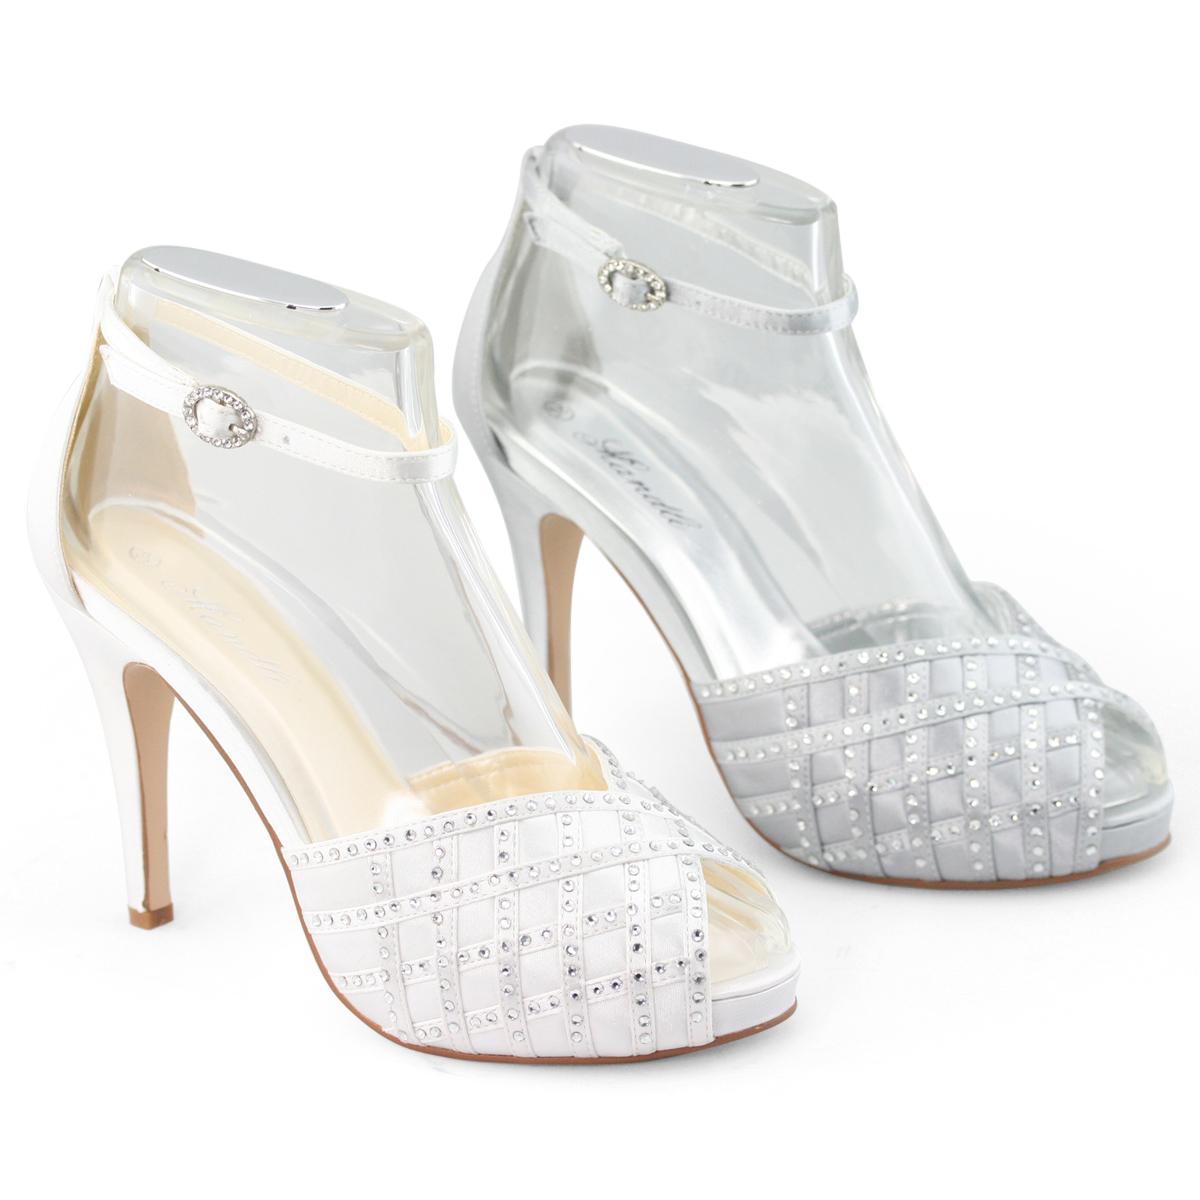 SHOEZY Womens Silver Heels Bridals Sandals Wedding Pumps ...